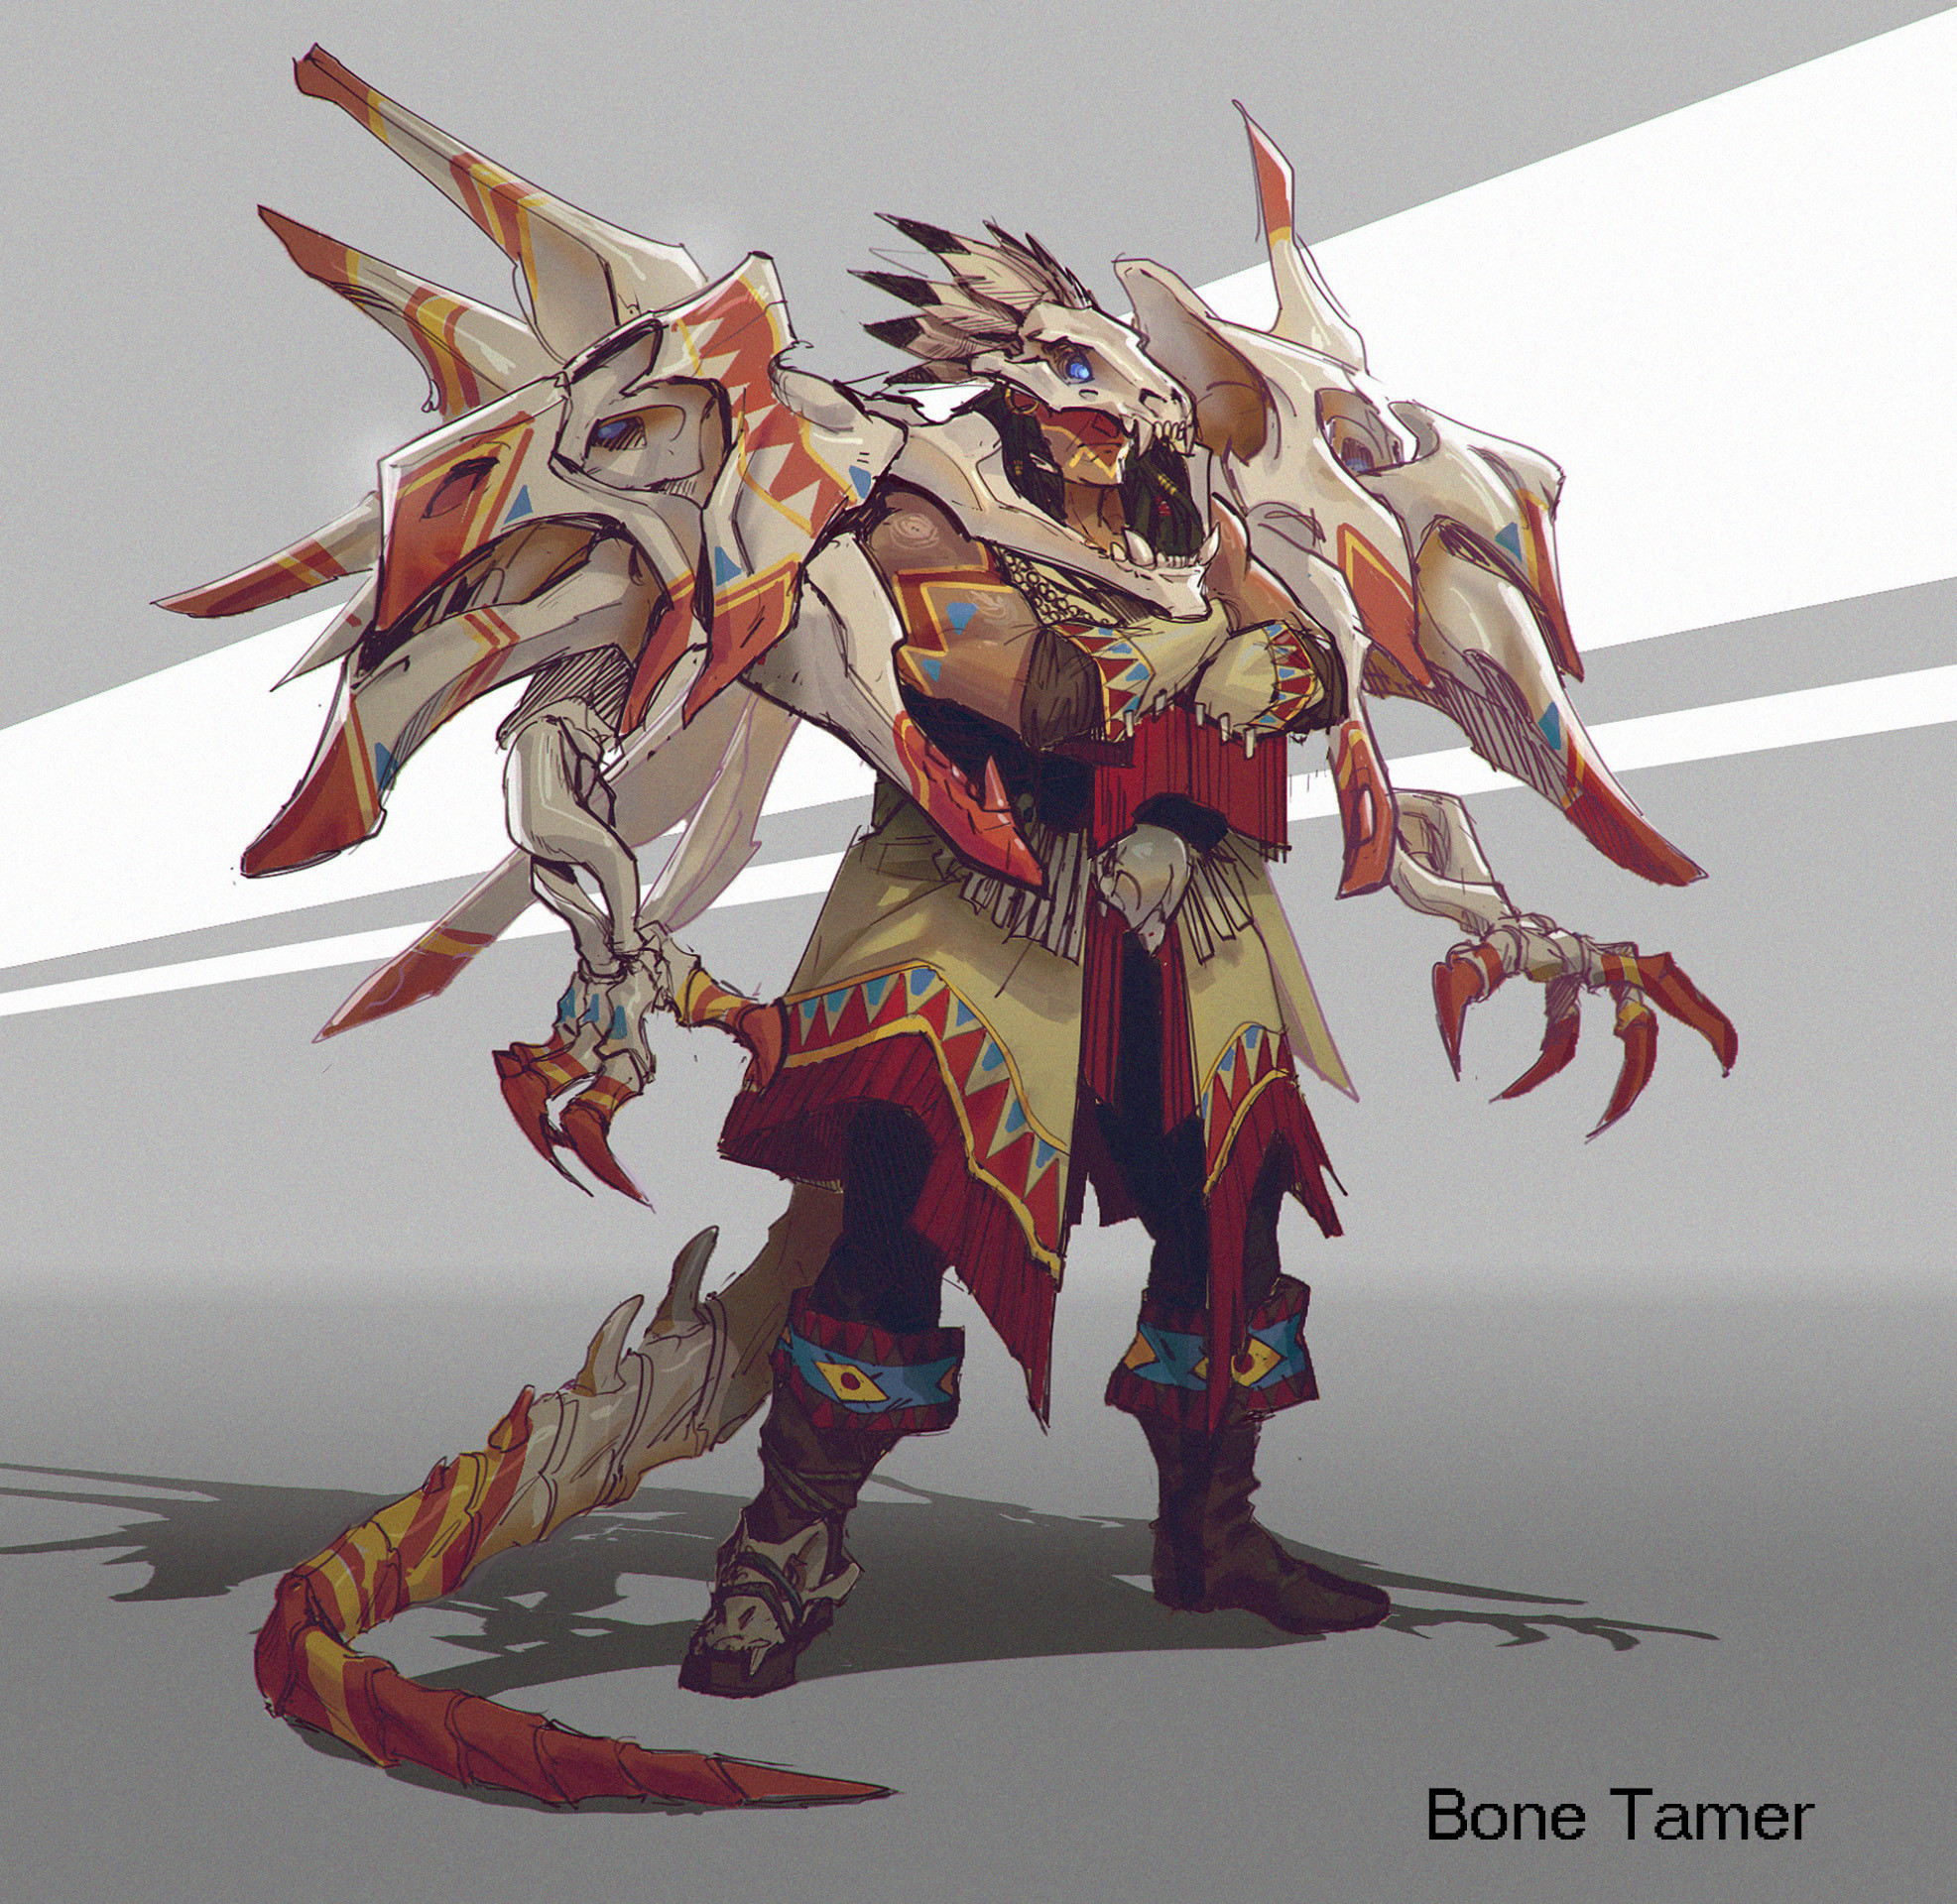 Bone Tamer